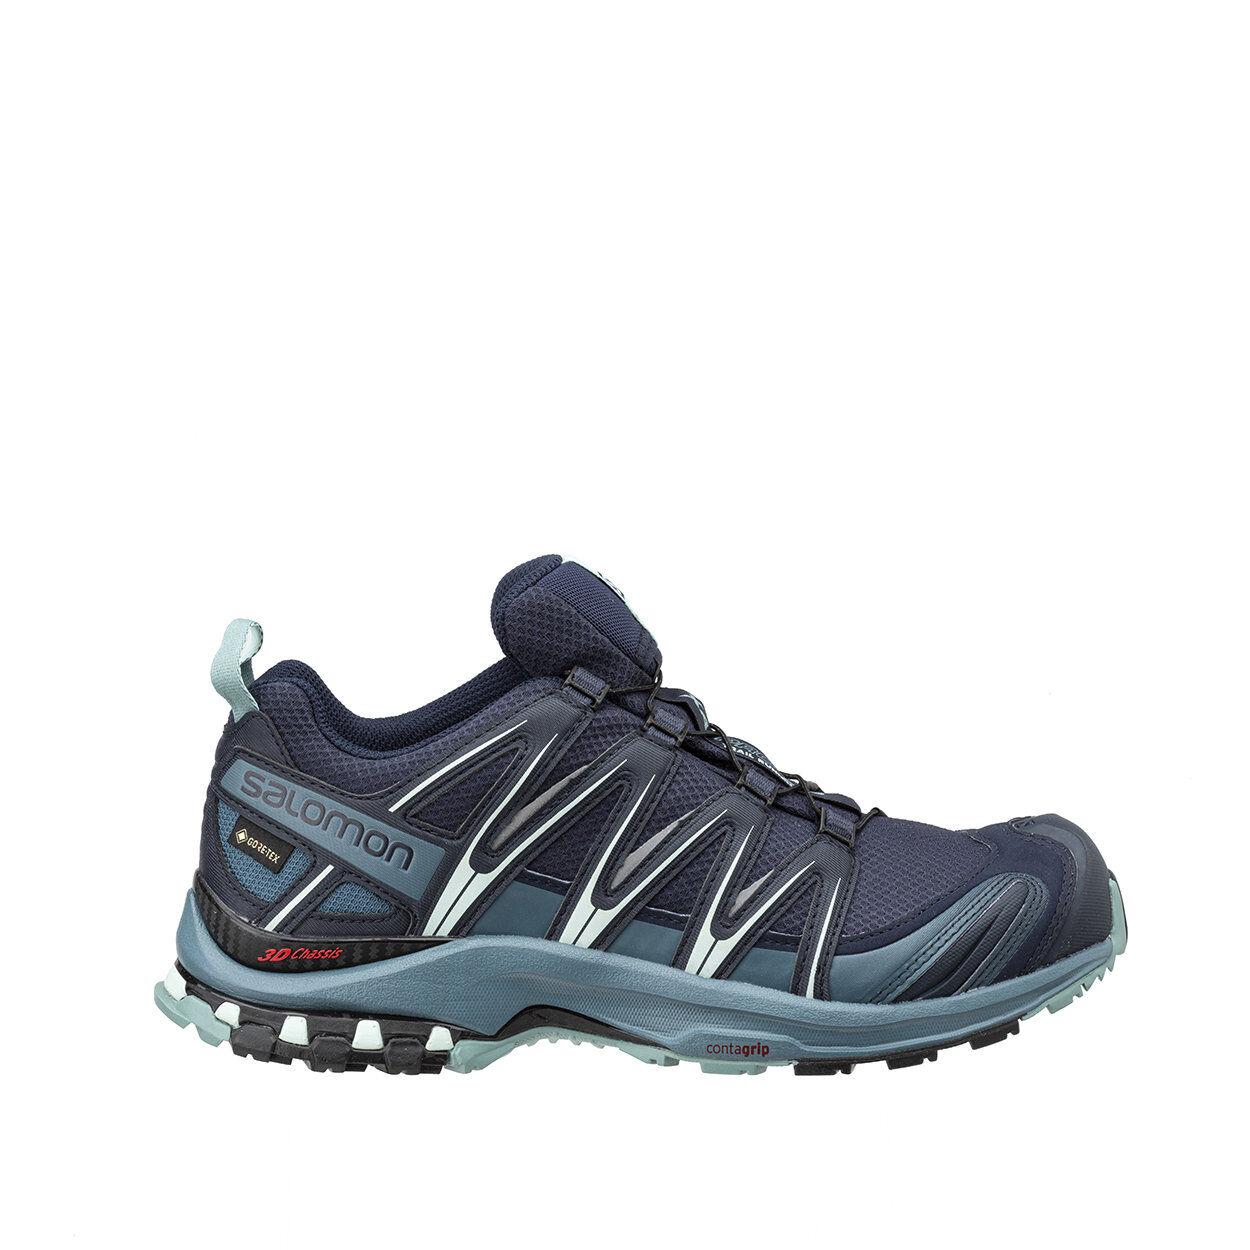 salomon xa pro 3d gtx - scarpe trail running navy blu